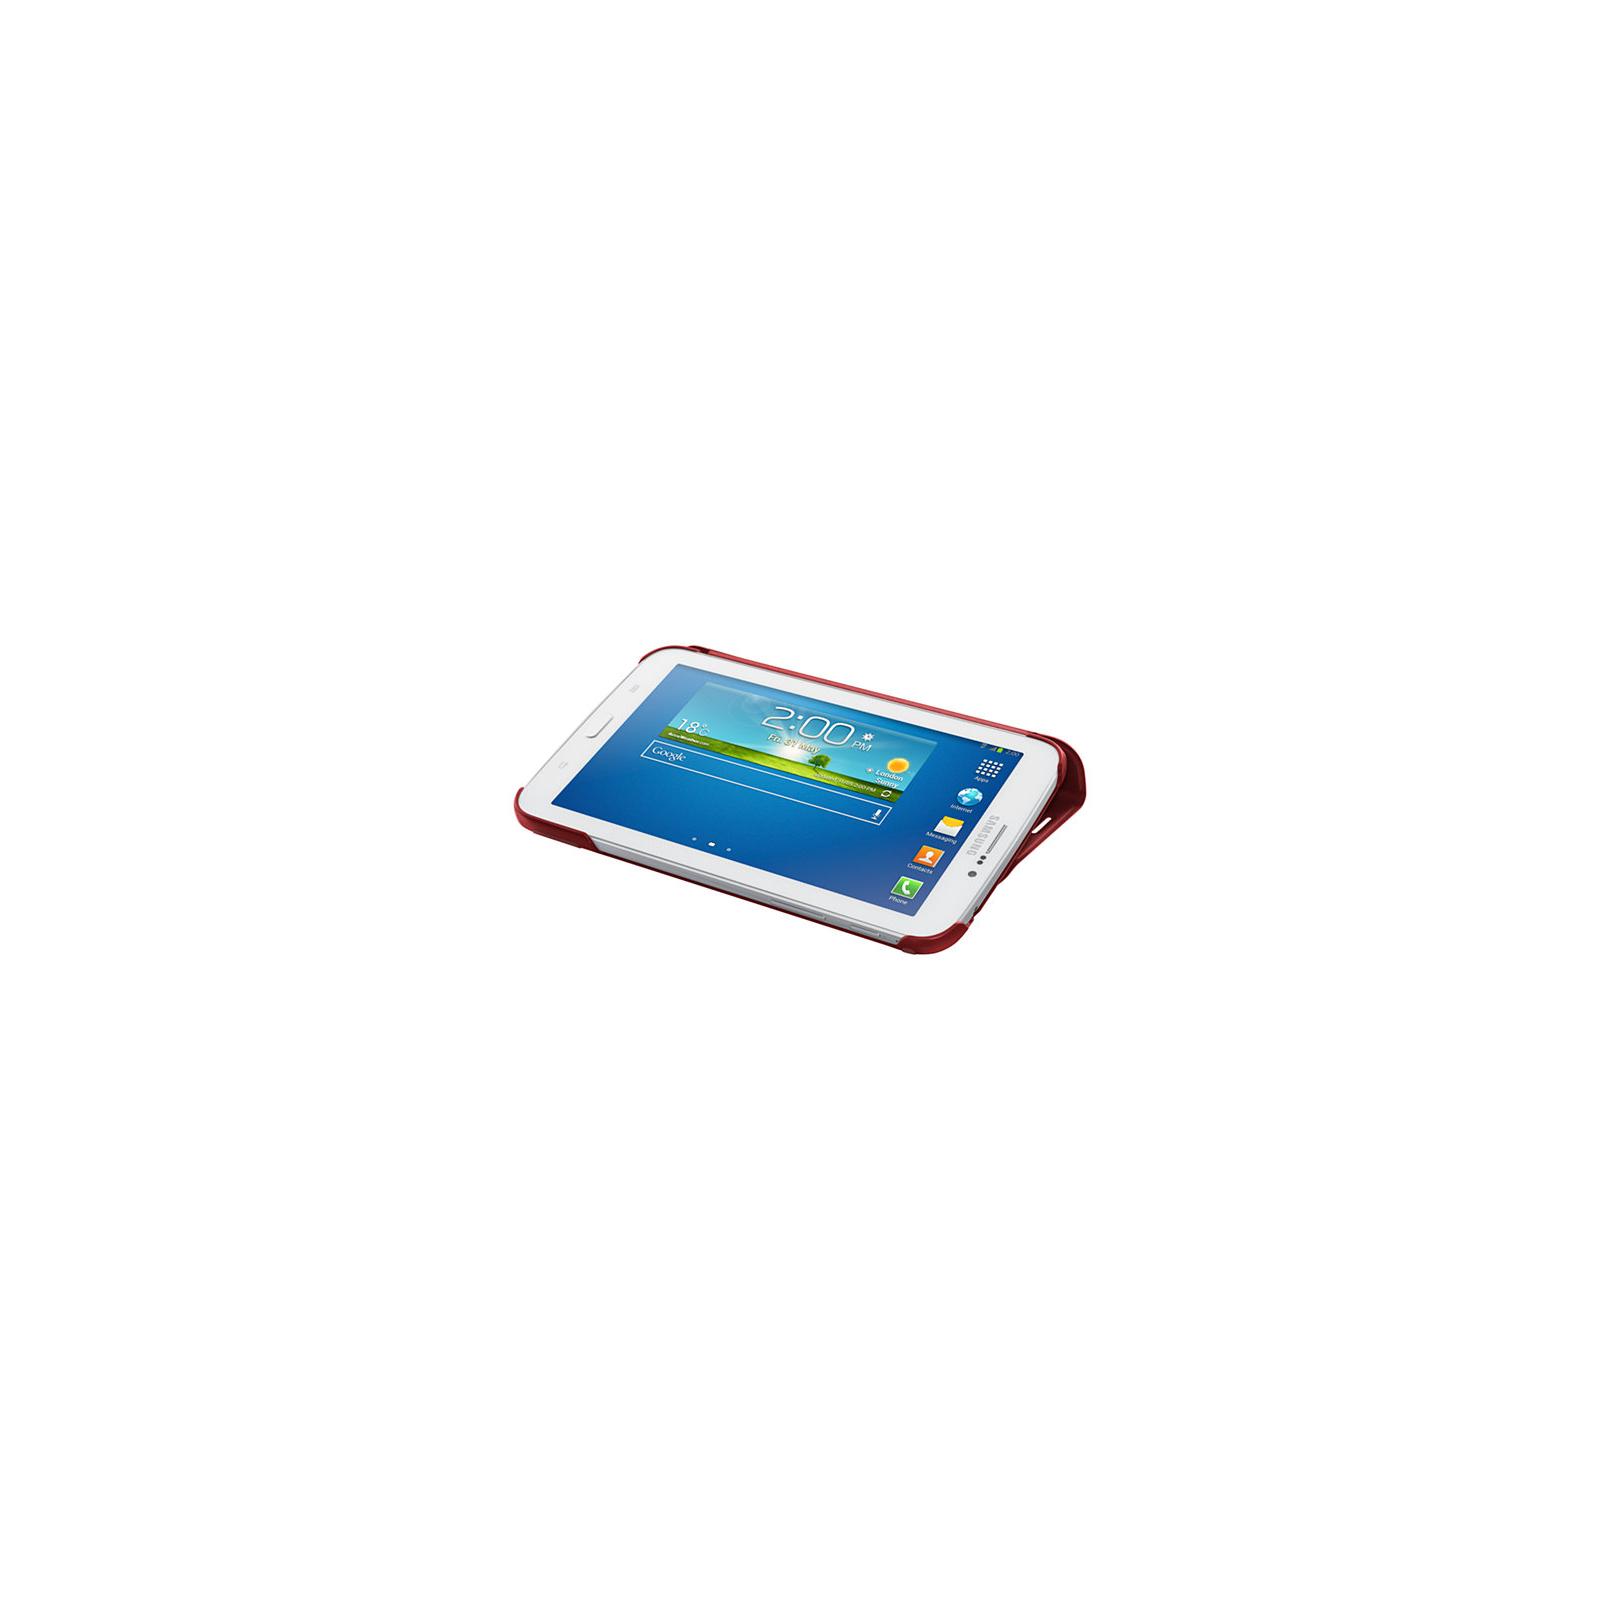 Чехол для планшета Samsung 7 GALAXY Tab 3 (EF-BT210BREGRU) изображение 4